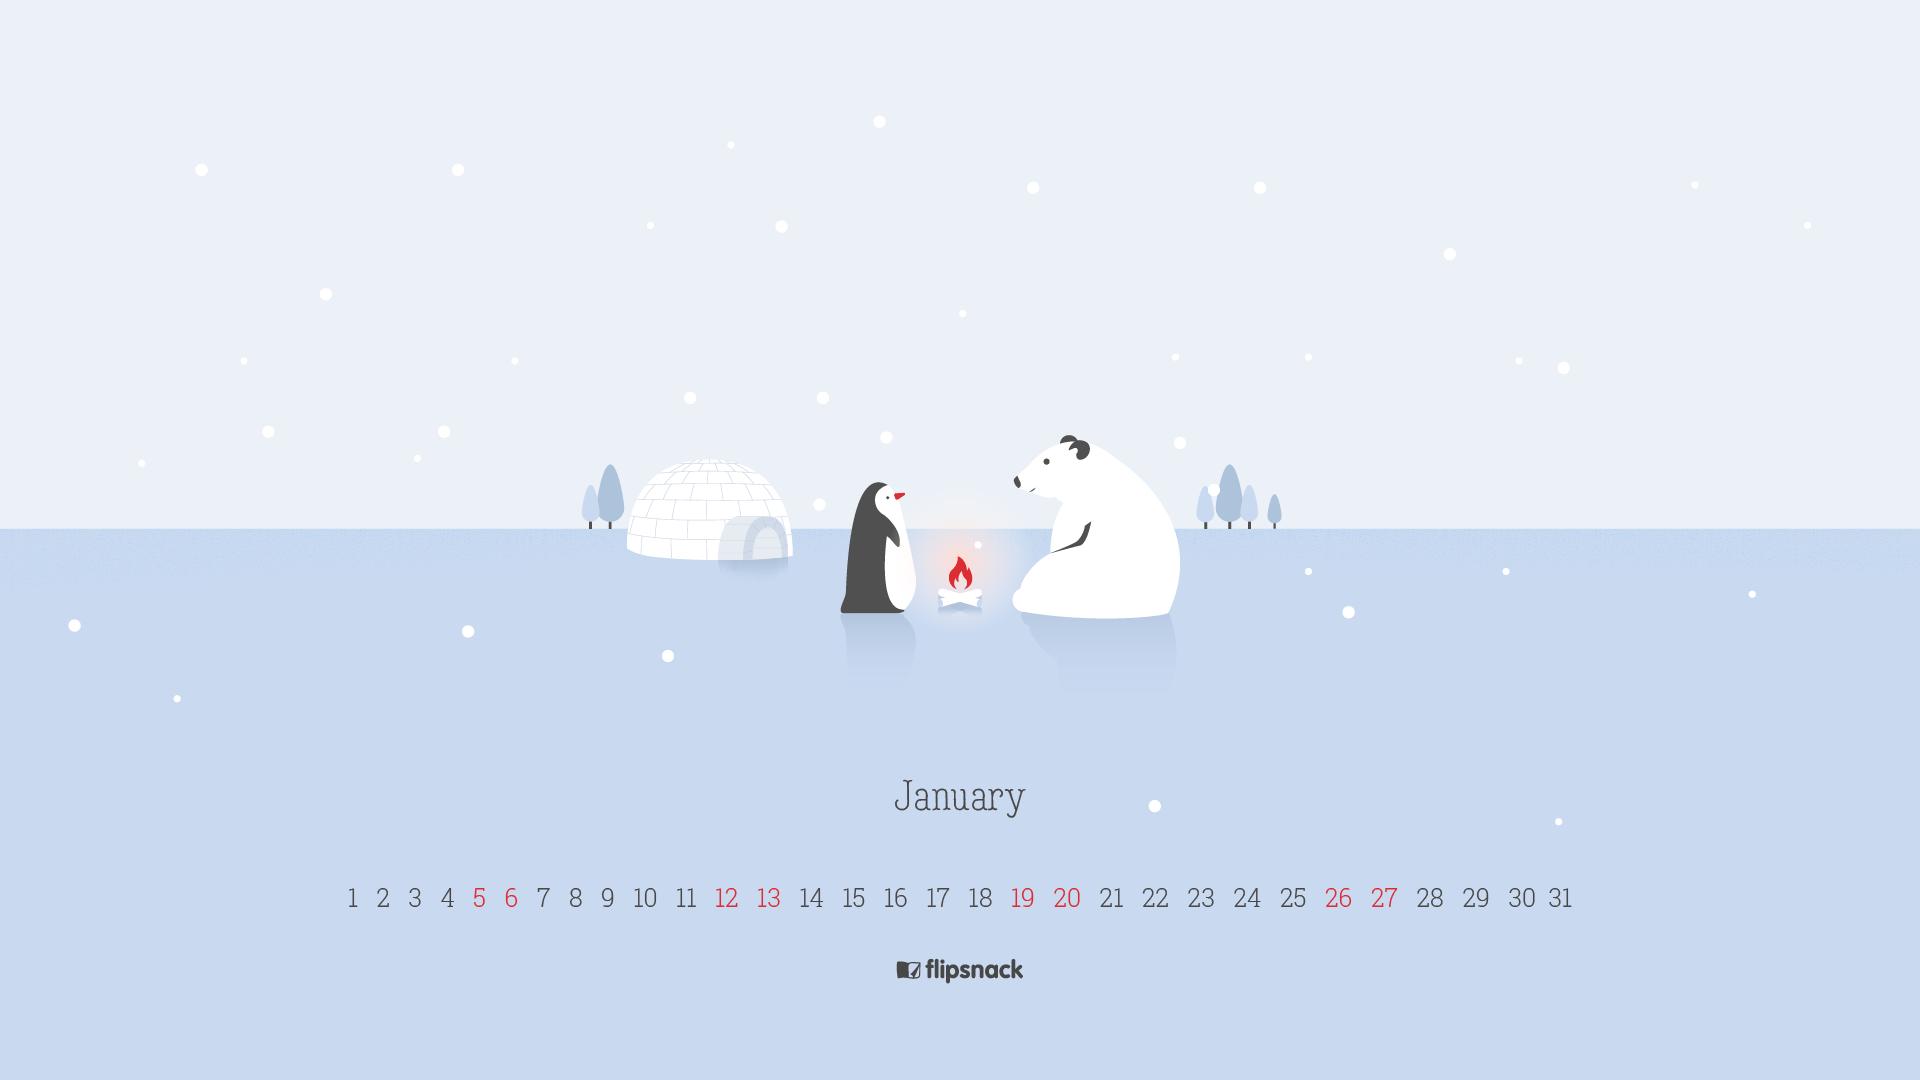 January 2019 wallpaper calendars   Flipsnack Blog 1920x1080